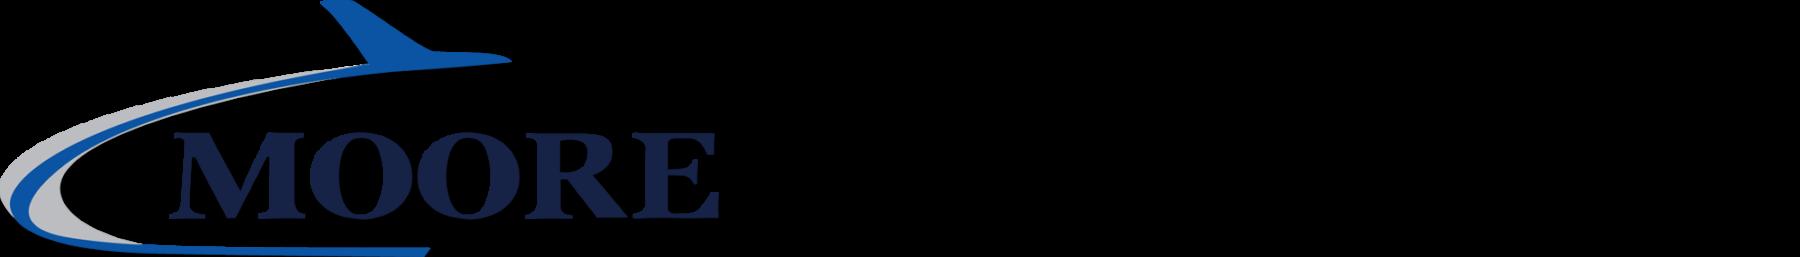 MCAPLogo-web-shadow.png